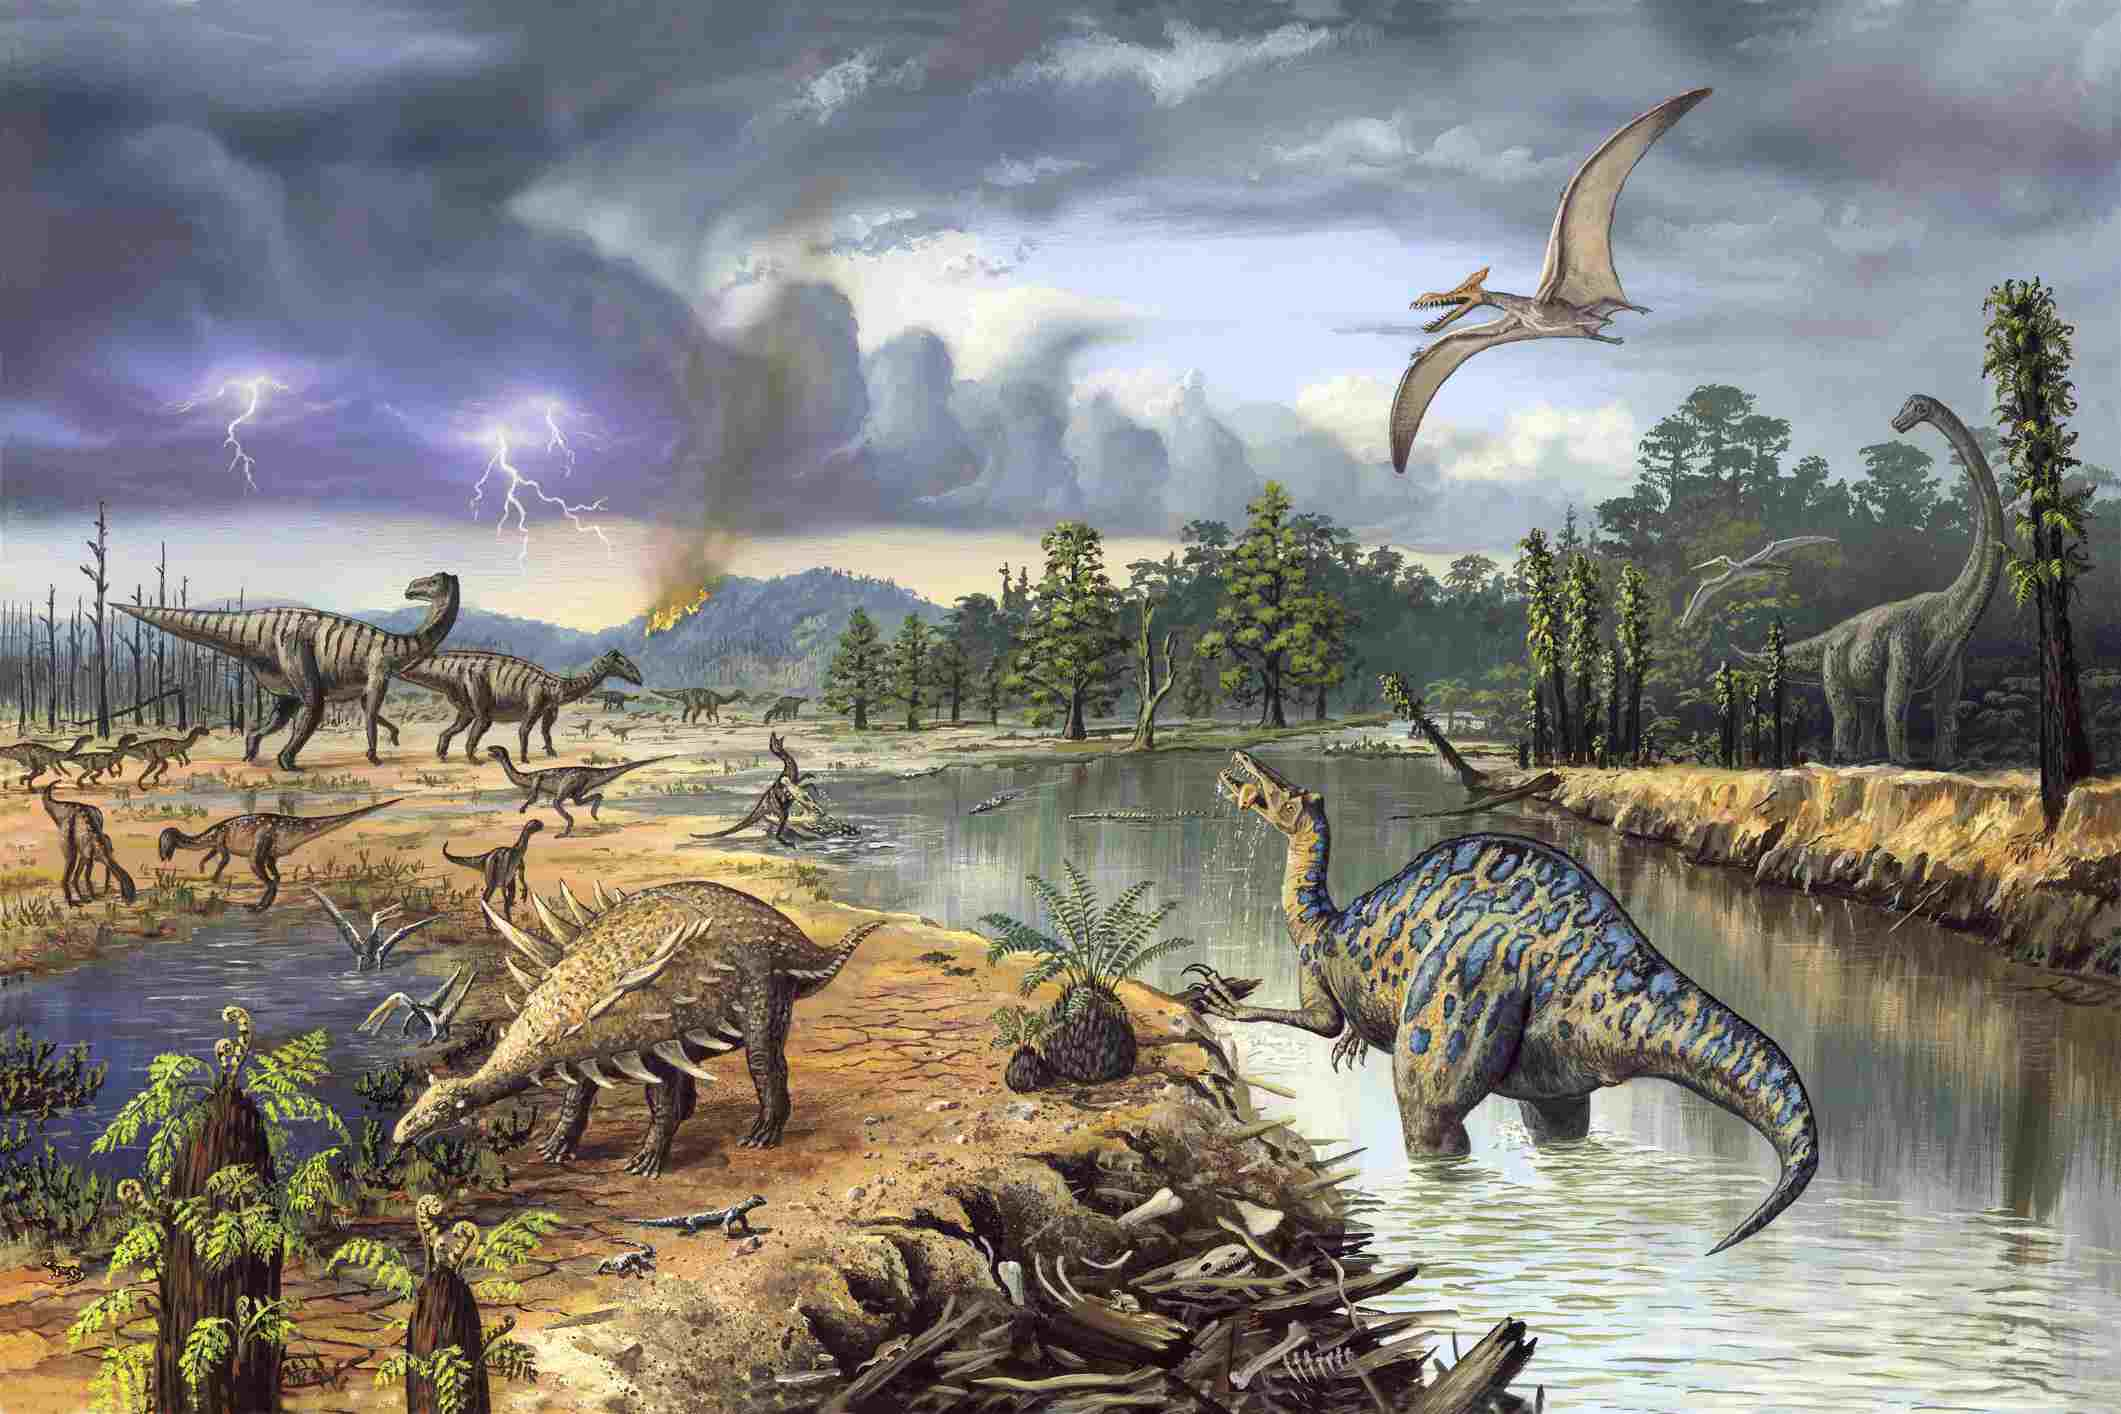 Early Cretaceous life, artwork